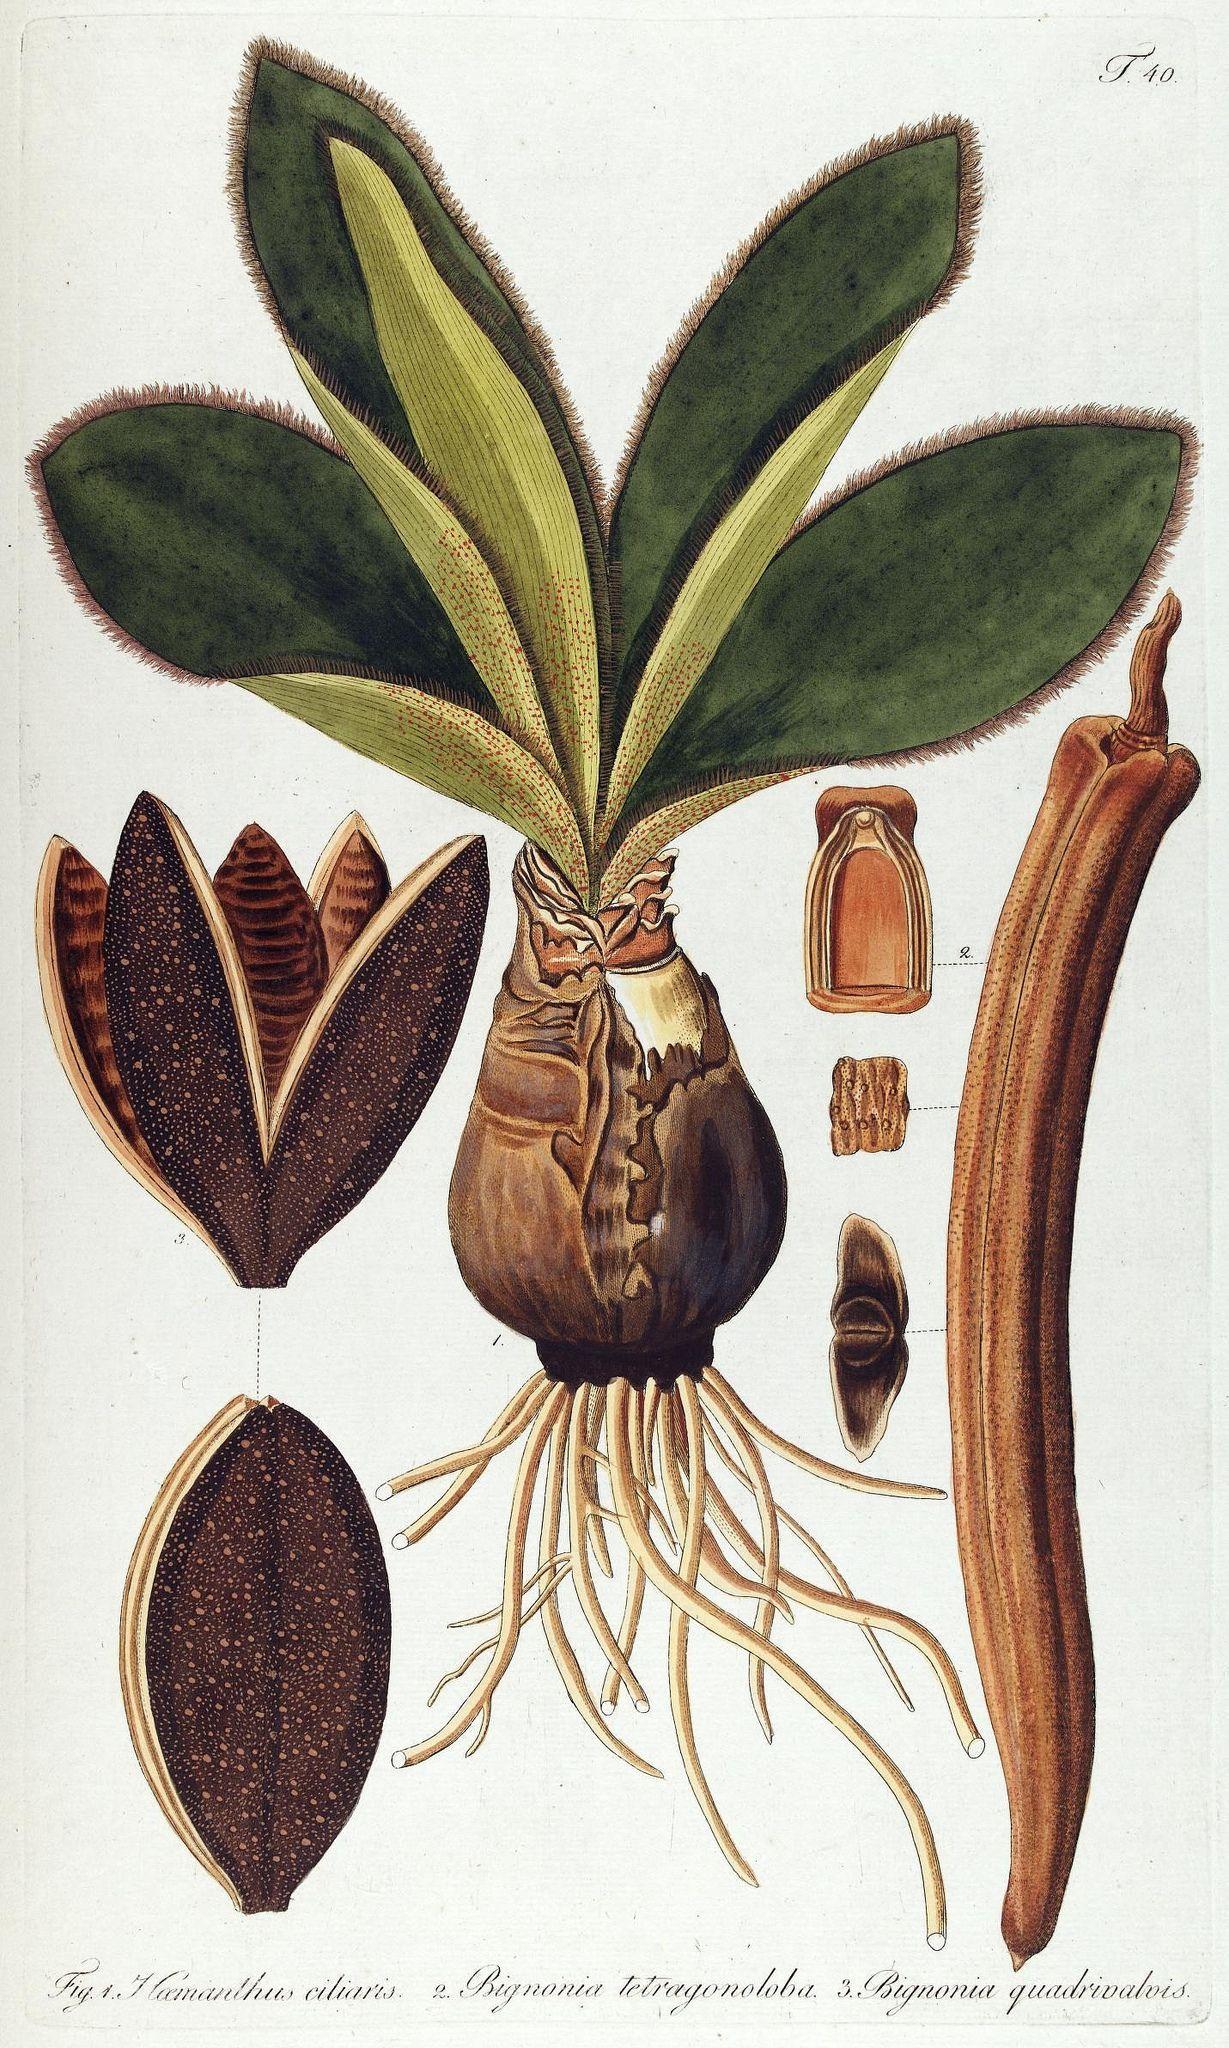 Fragmenta botanica, figuris coloratis illustrata. Viennae, Austriae : Typis Mathiae Andreae Schmidt, typogr. Universit., 1809.. biodiversitylibrary.org/page/287669